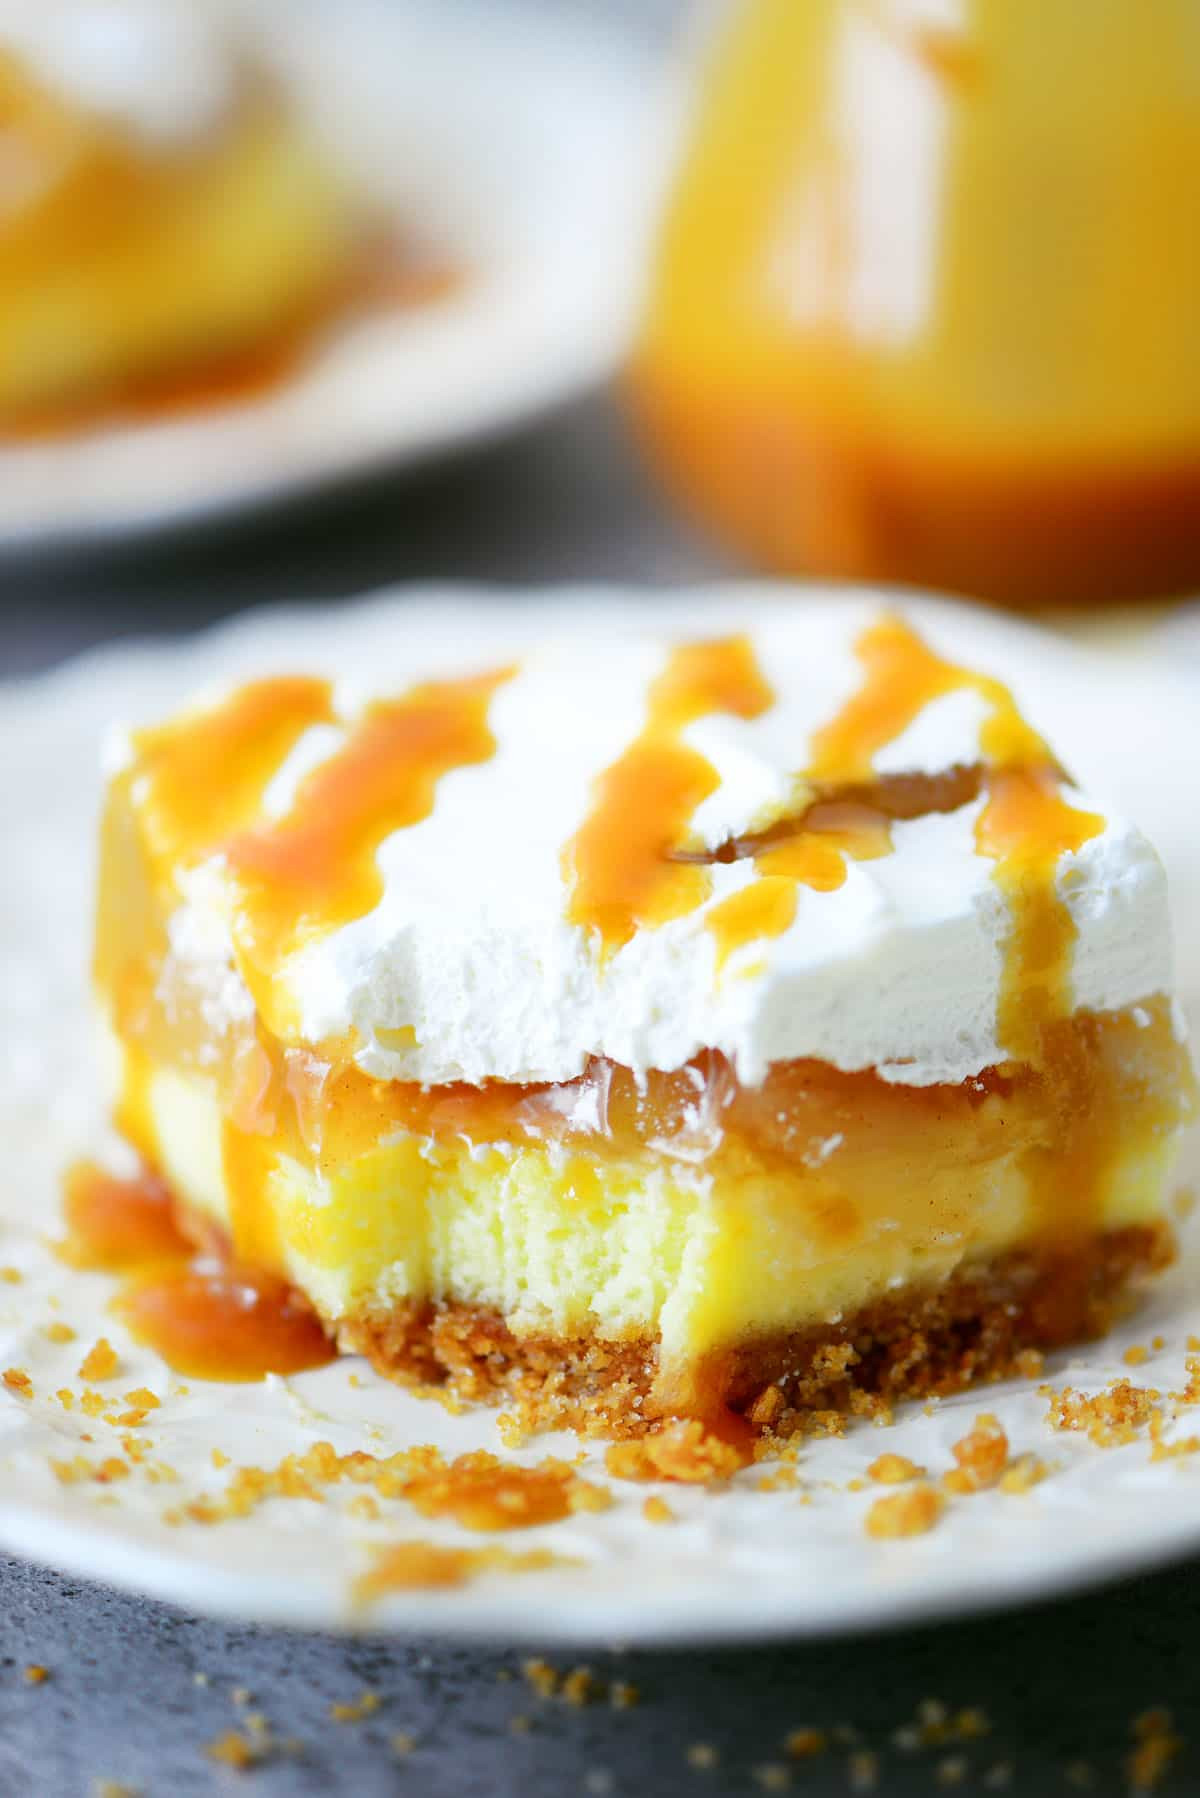 Caramel Apple Dessert  Caramel Apple Cheesecake Dessert Recipe